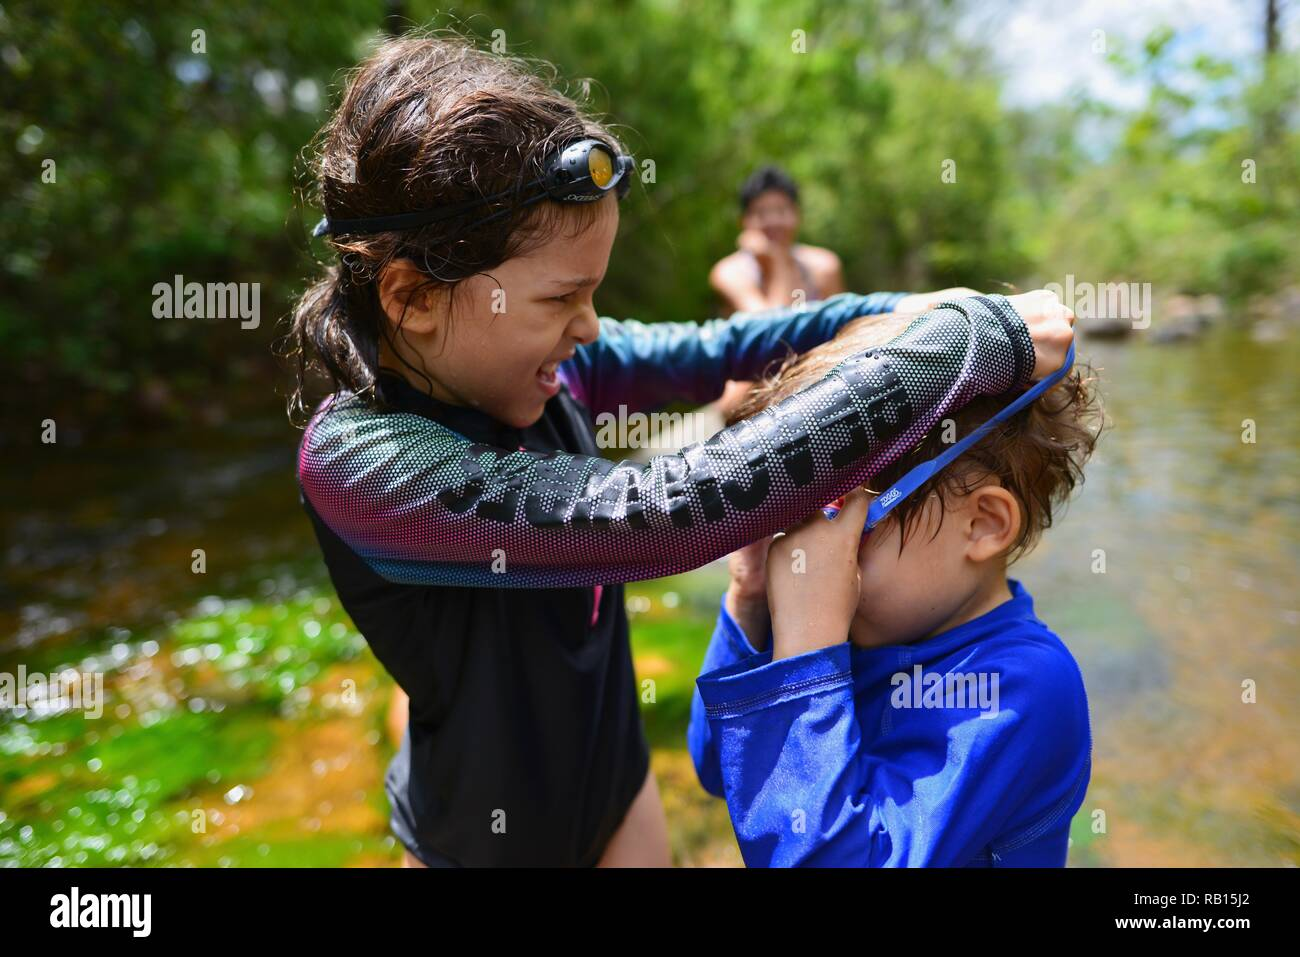 A mother watches her children swim in a stream, Alligator Creek, Townsville, Qld, Australia Stock Photo